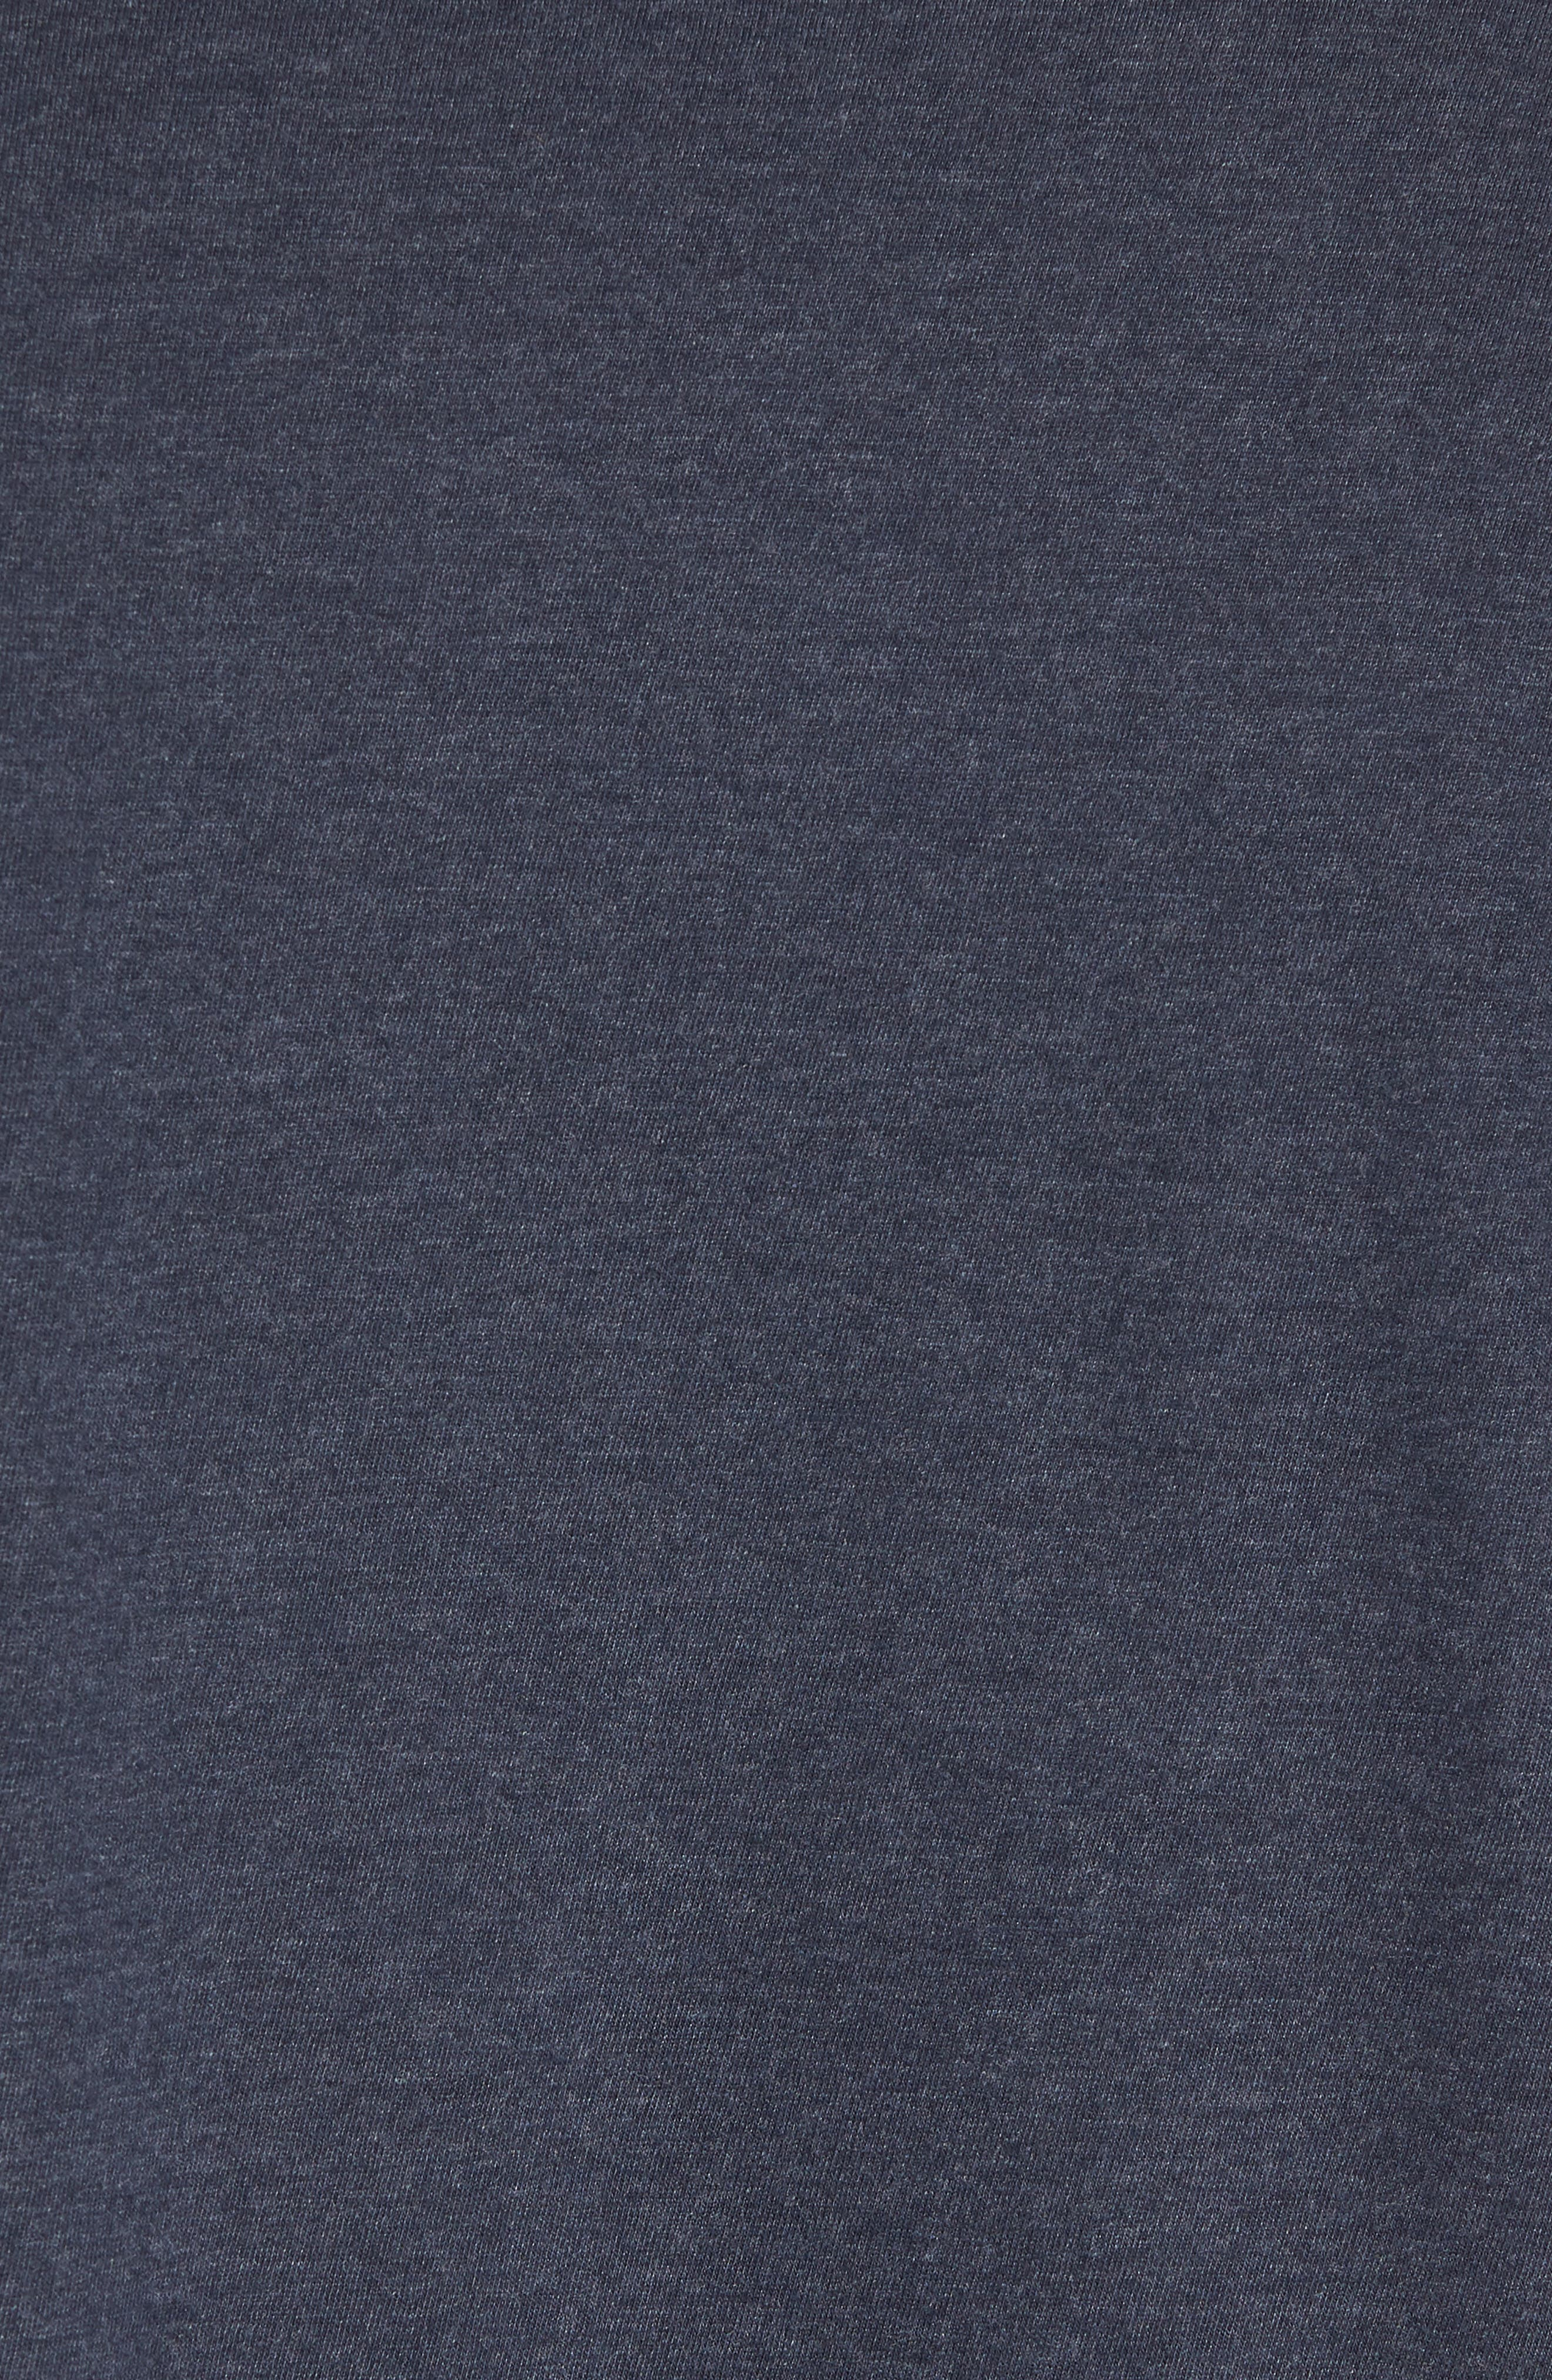 Halifax Crewneck T-Shirt,                             Alternate thumbnail 5, color,                             NAVY